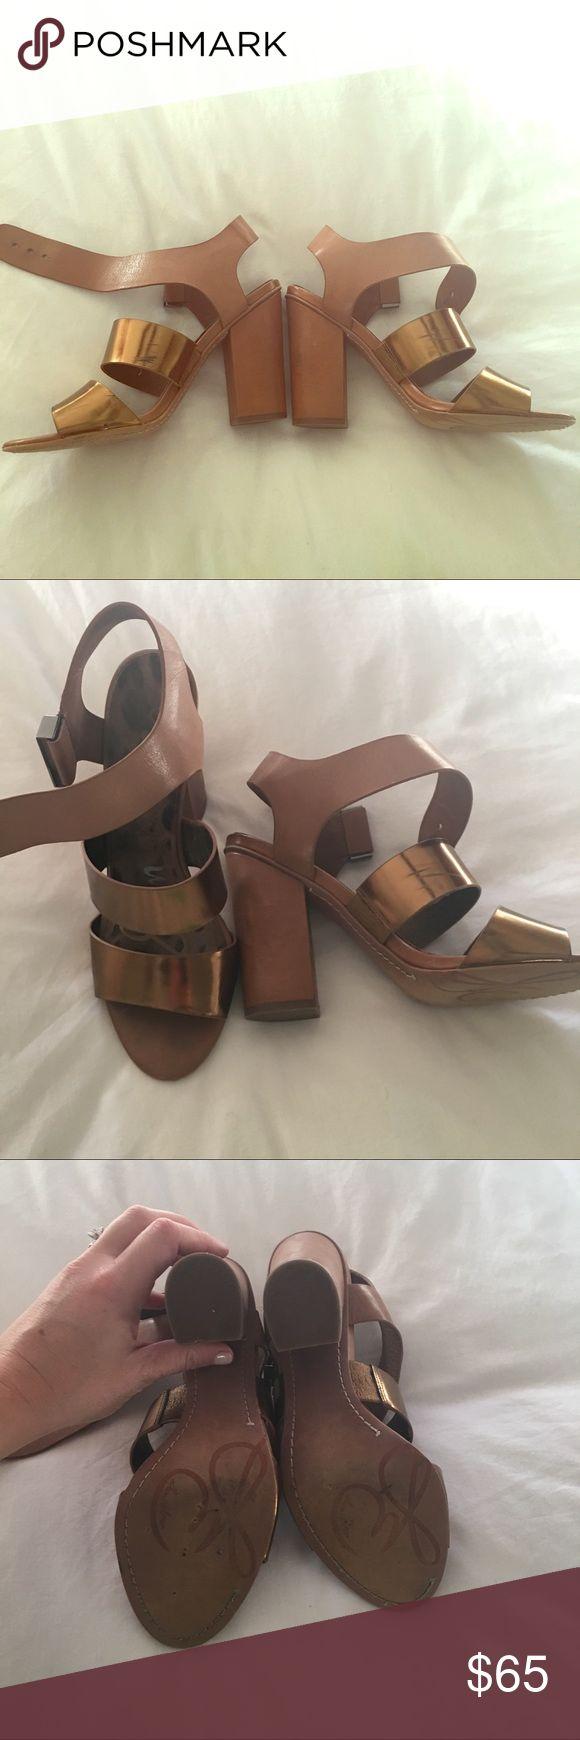 Sam Edelman two toned heels Amazing condition! Few scratch marks. 4 inch heel. Beautiful shoe!! Sam Edelman Shoes Heels